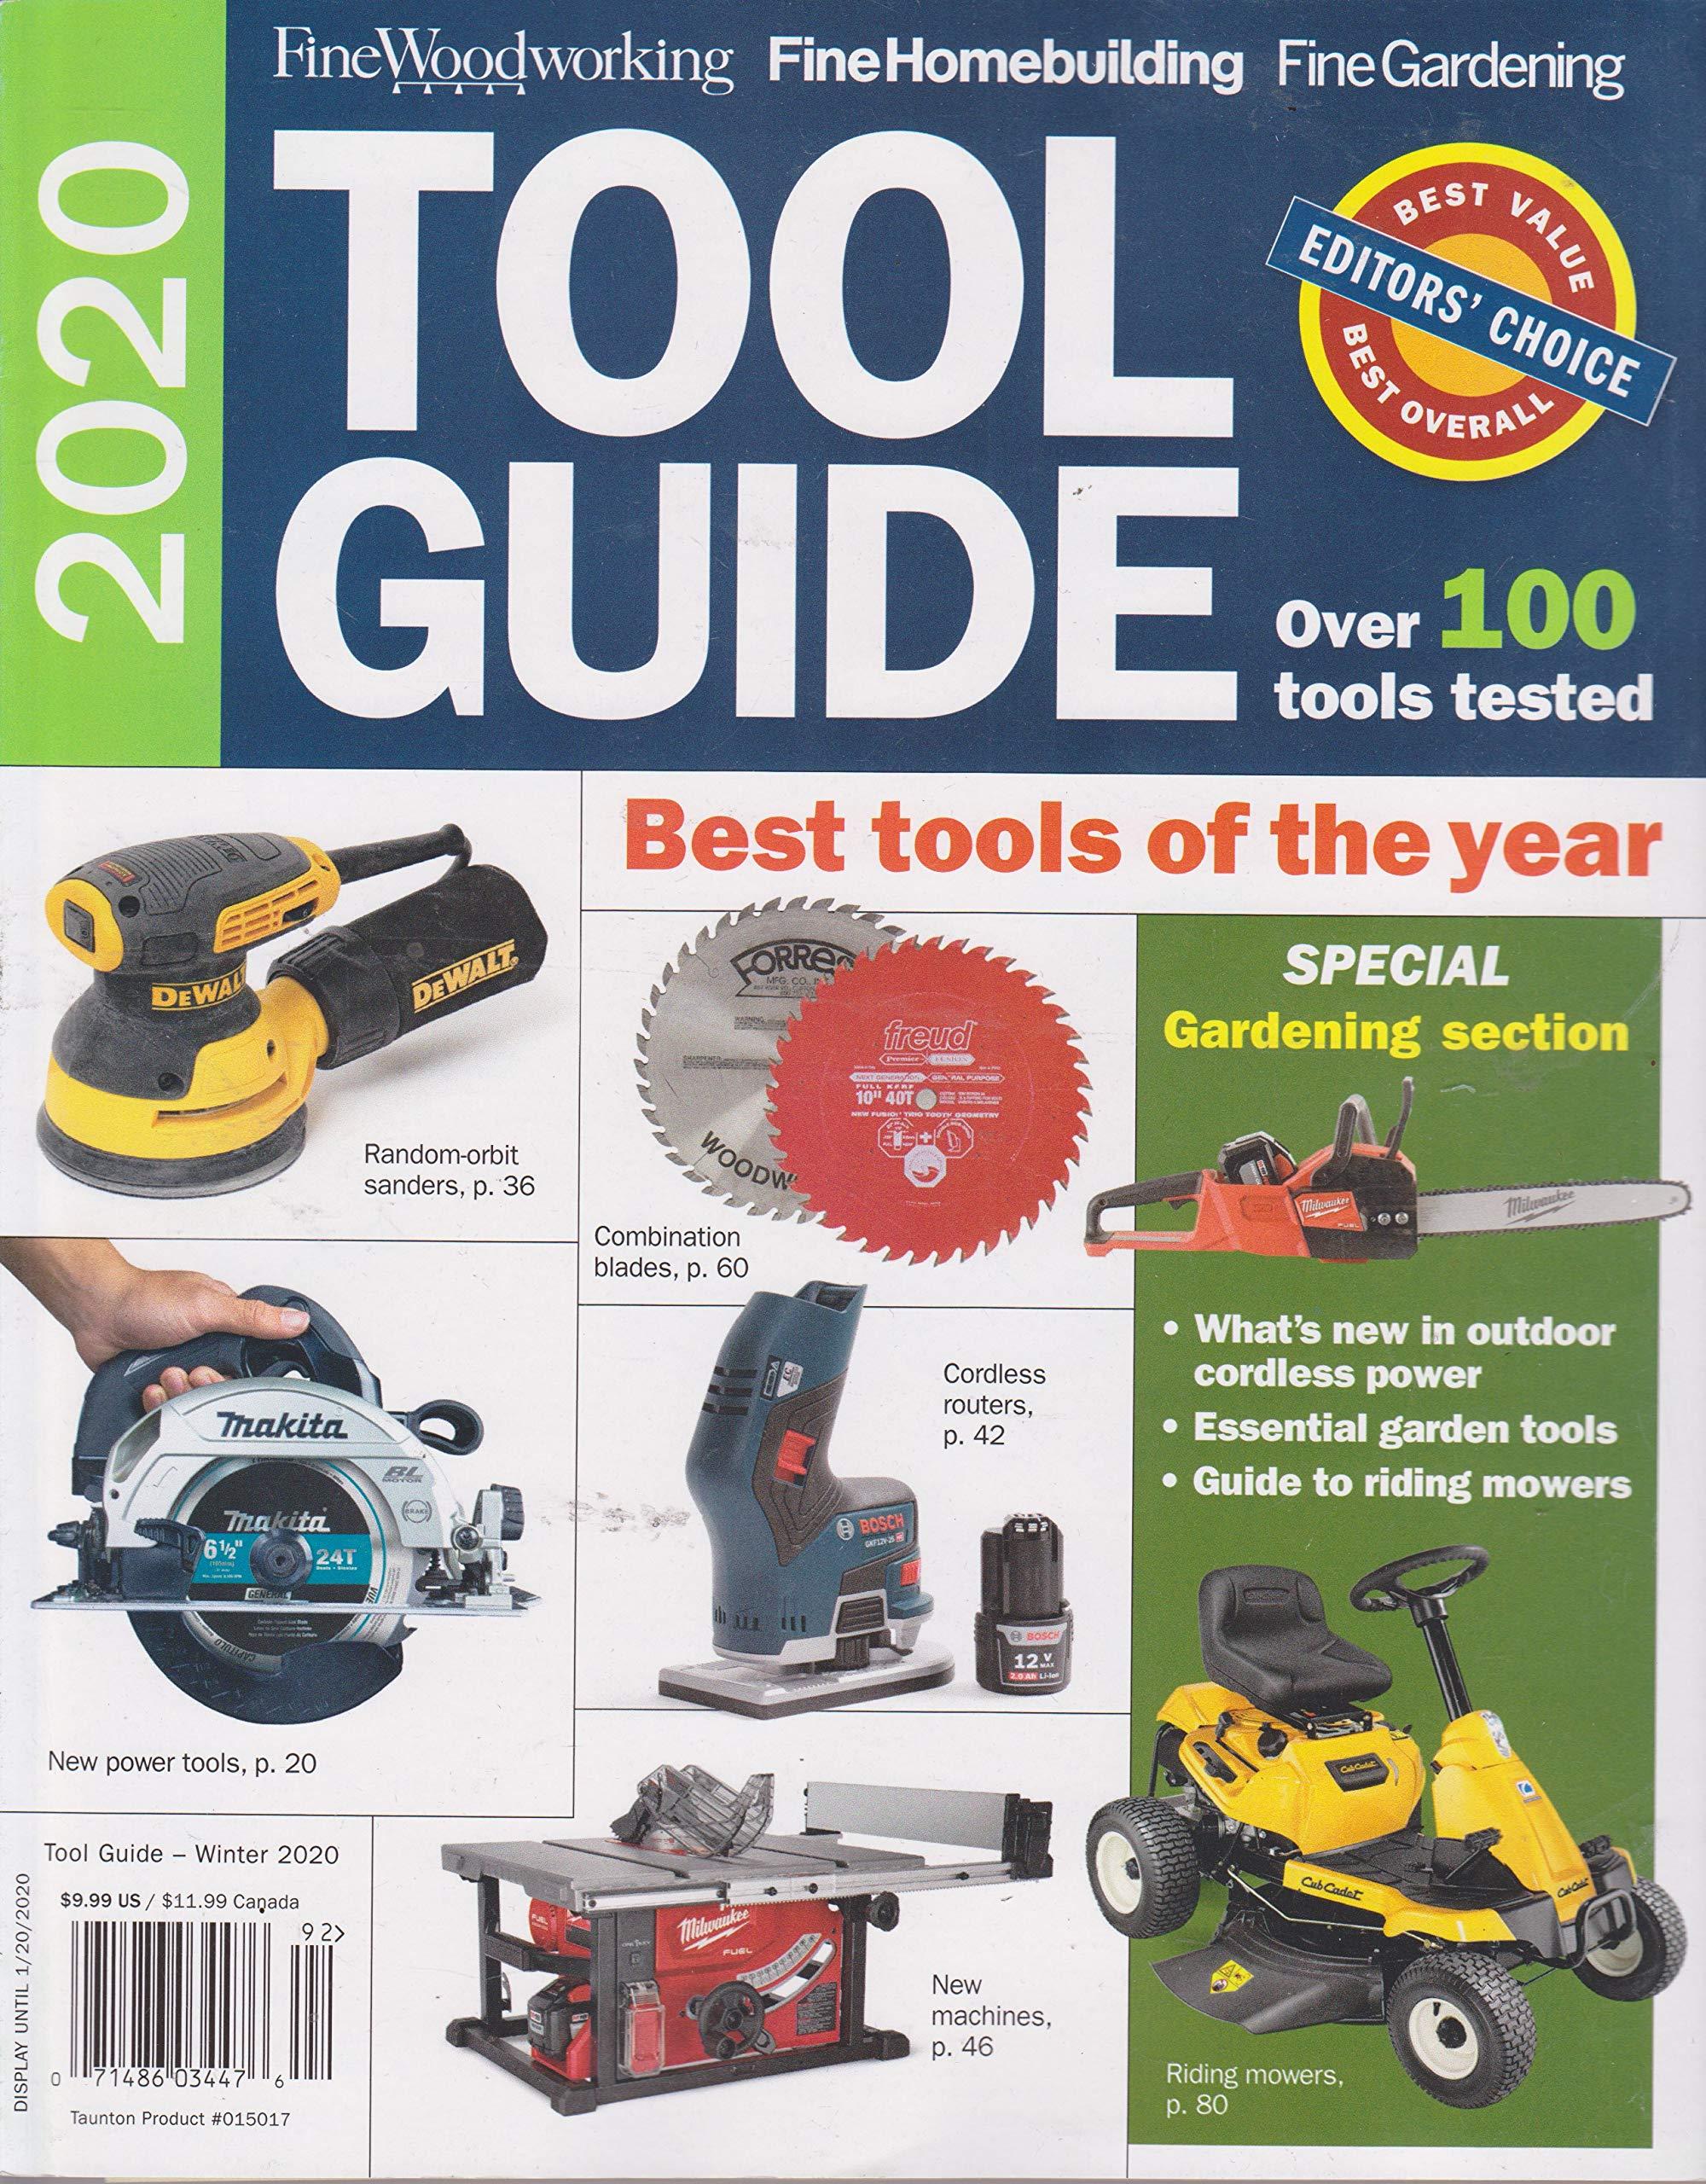 Fine Woodworking Tool Guide Winter 2020 Buy Online In Pakistan At Desertcart